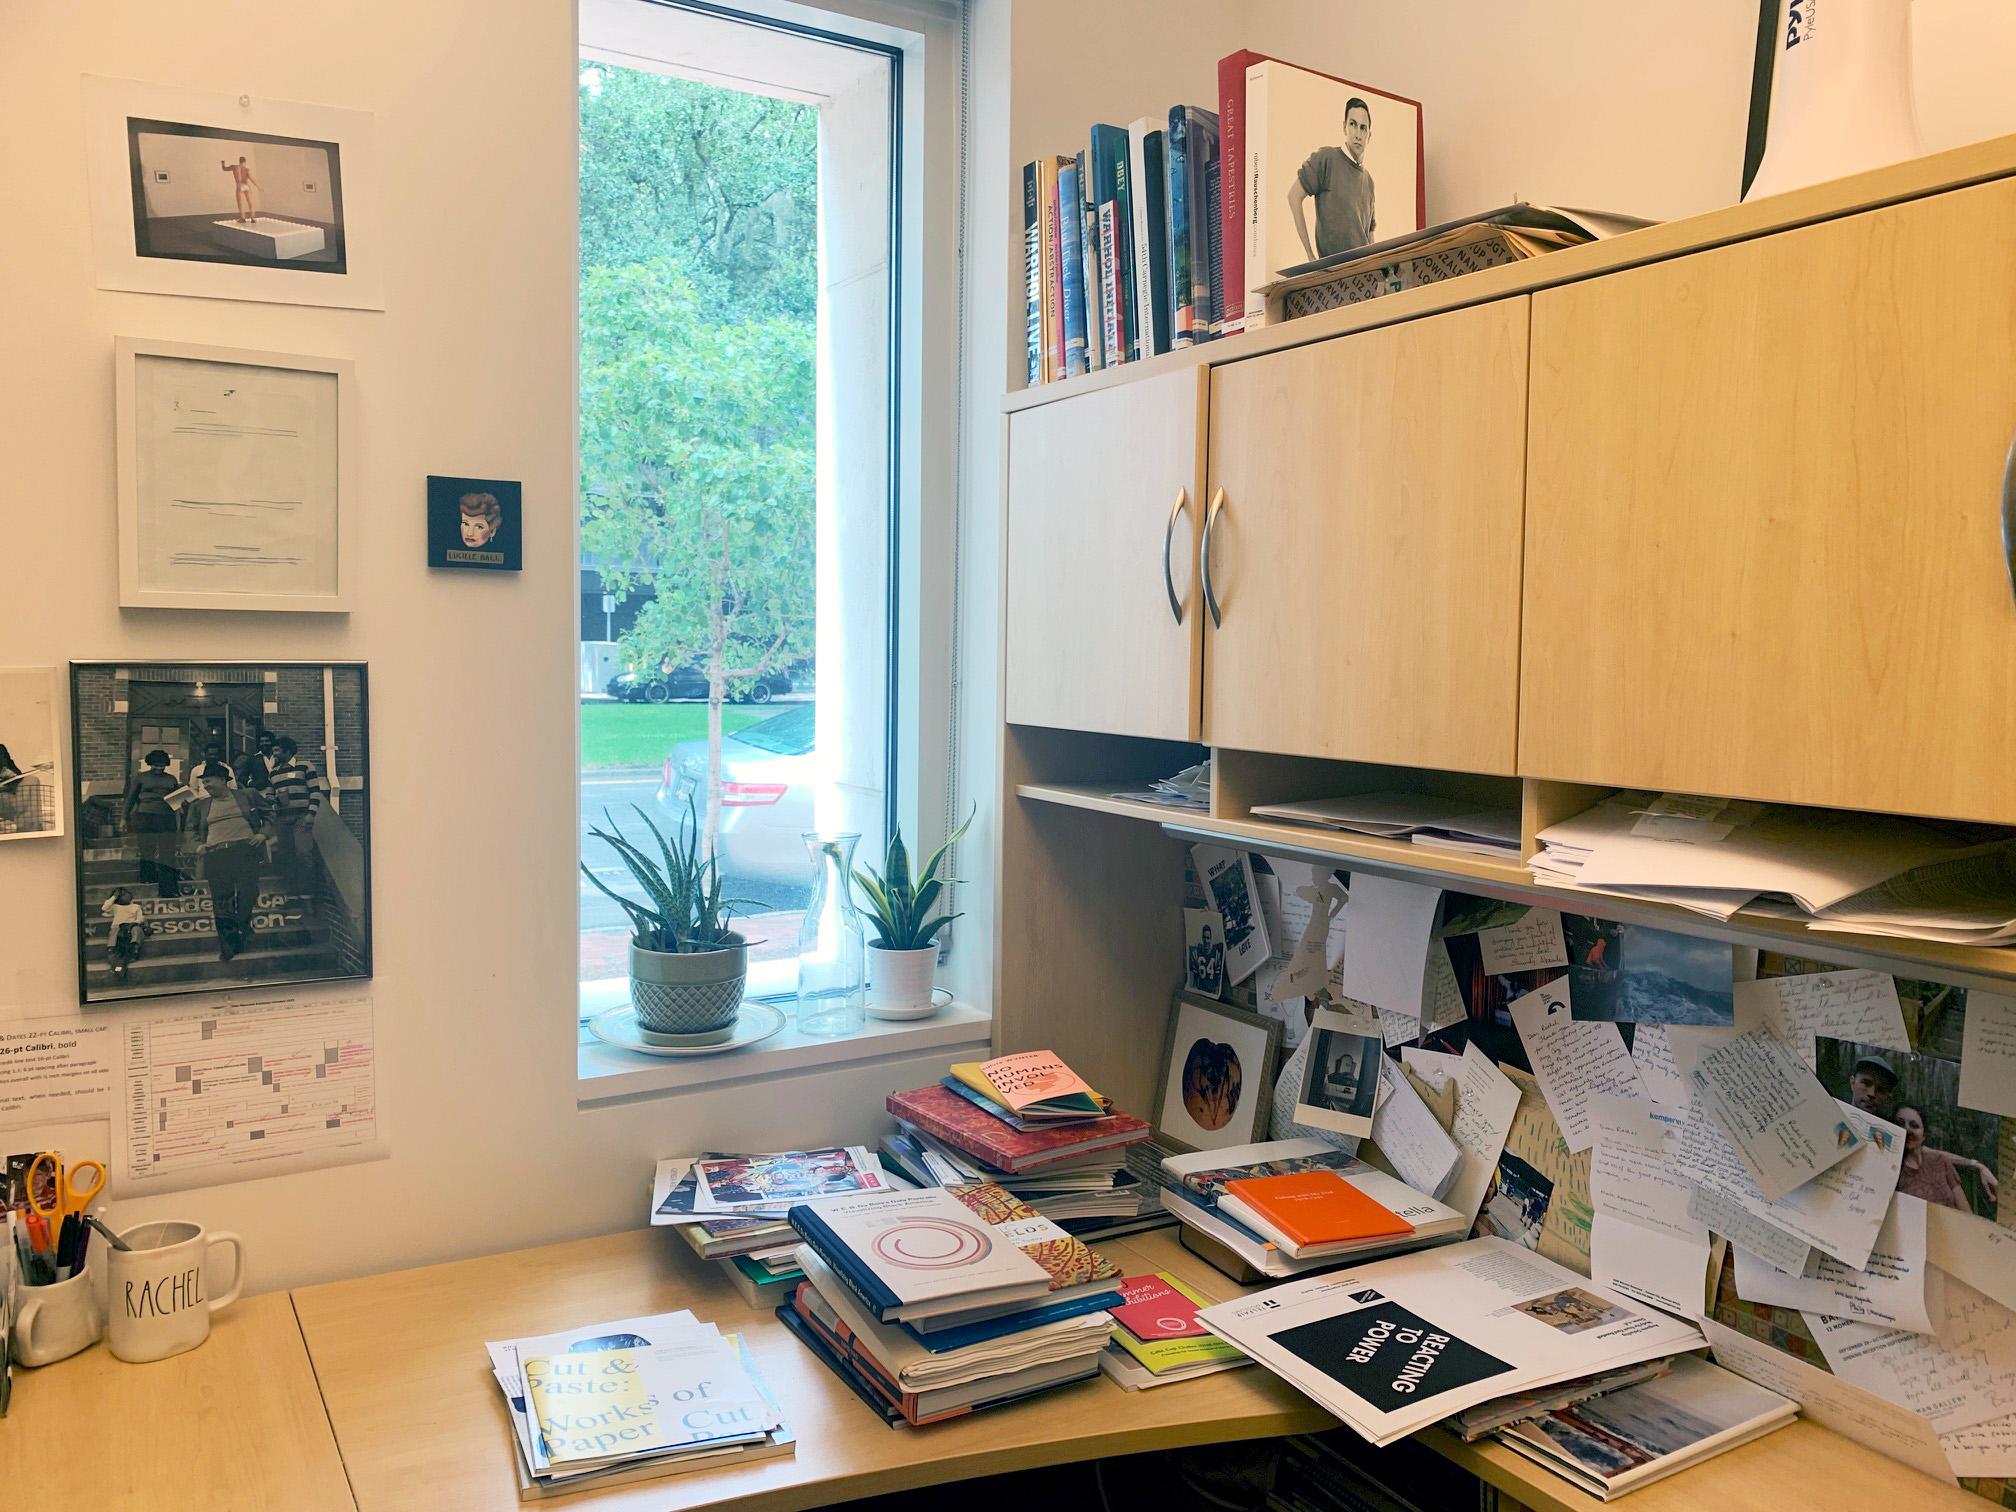 Rachel Reese's office at Telfair Museums.